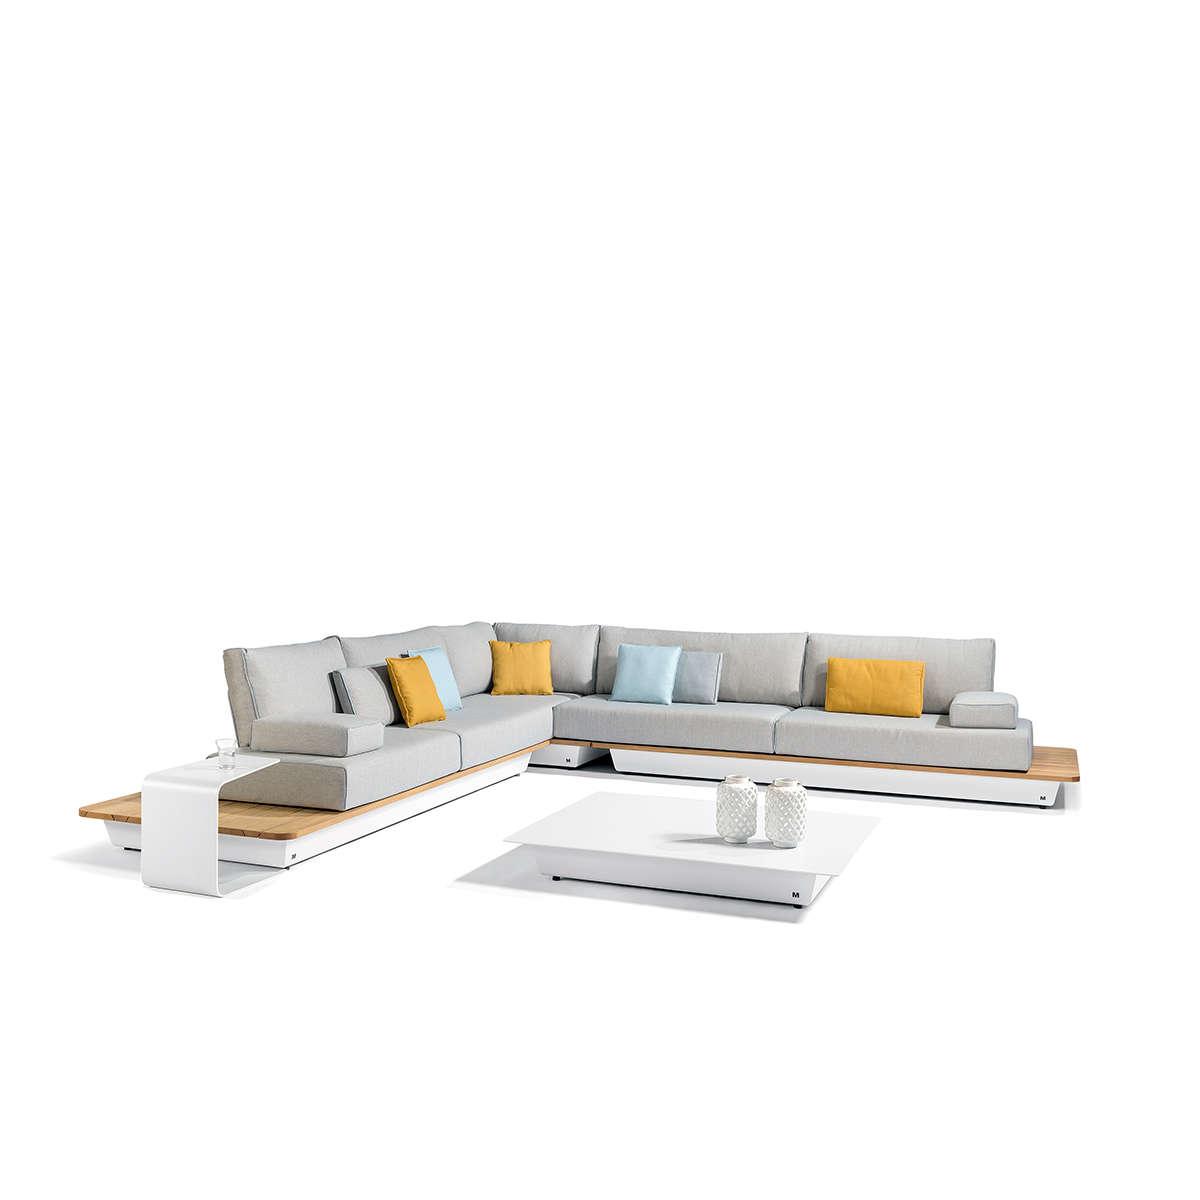 Manutti Fuse Lounge Chair3